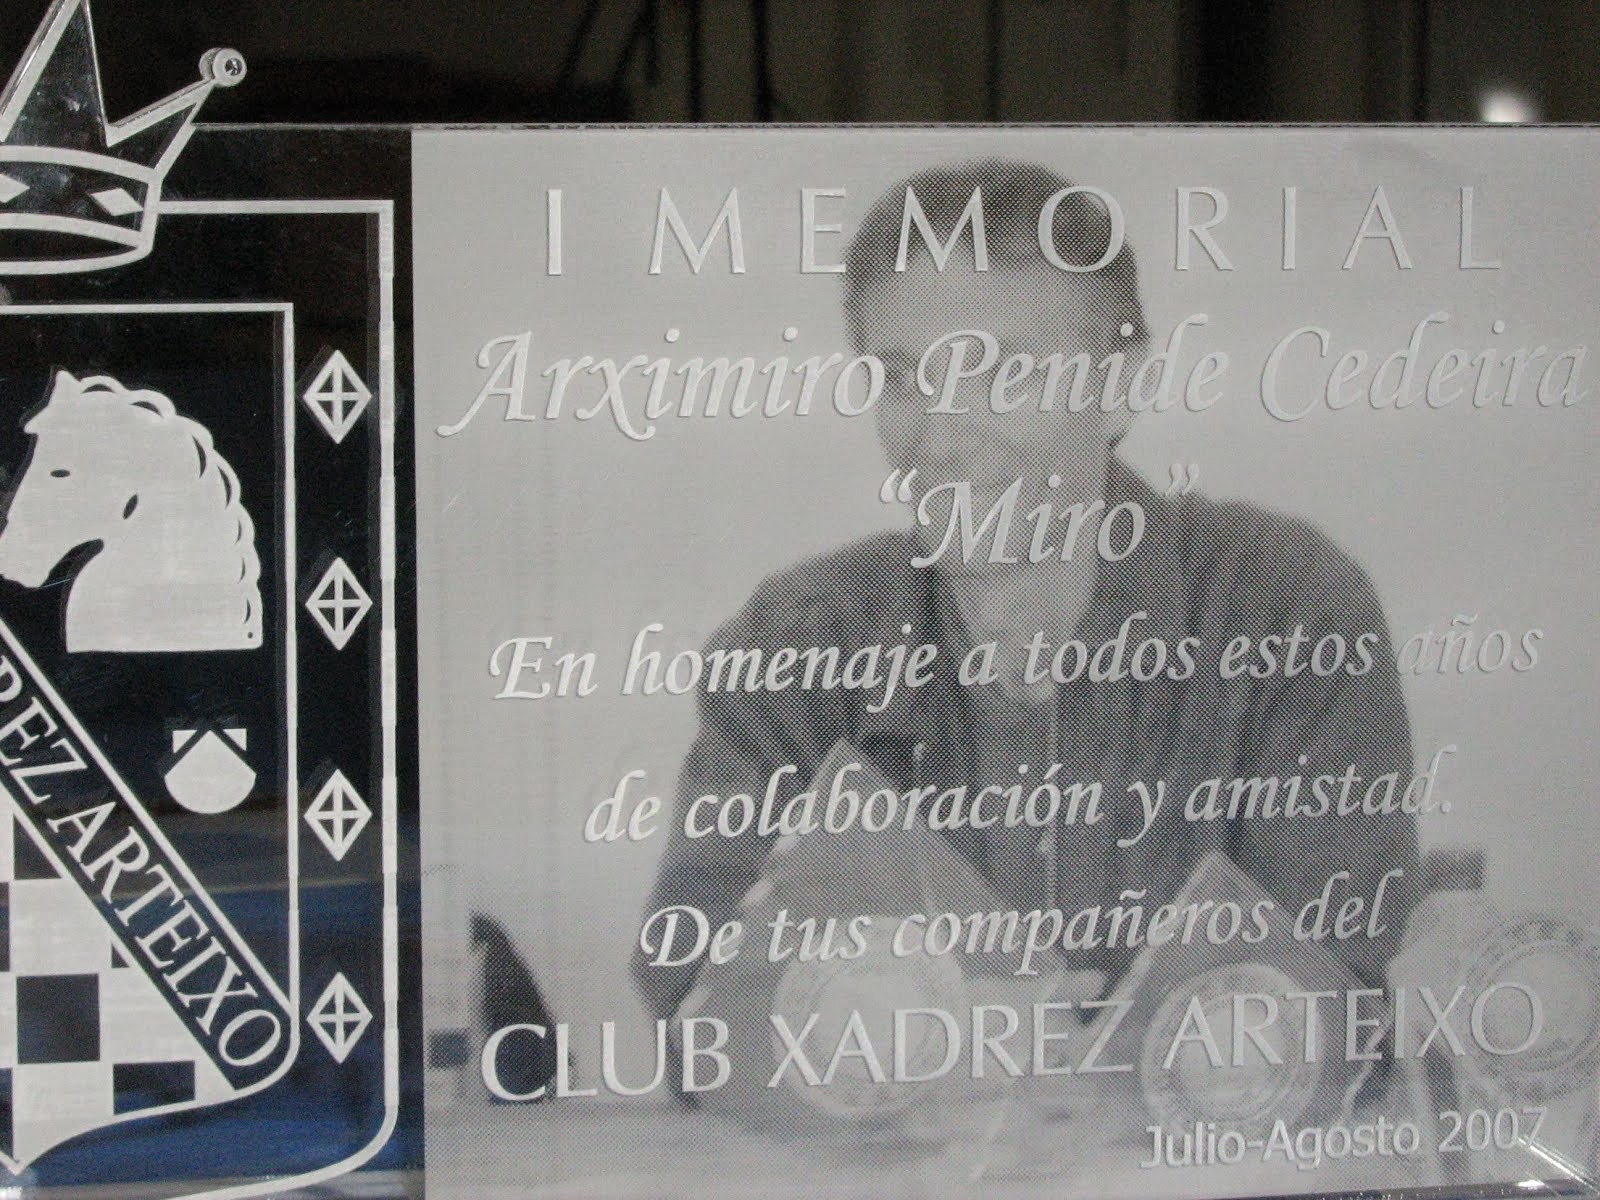 Club Xadrez Arteixo